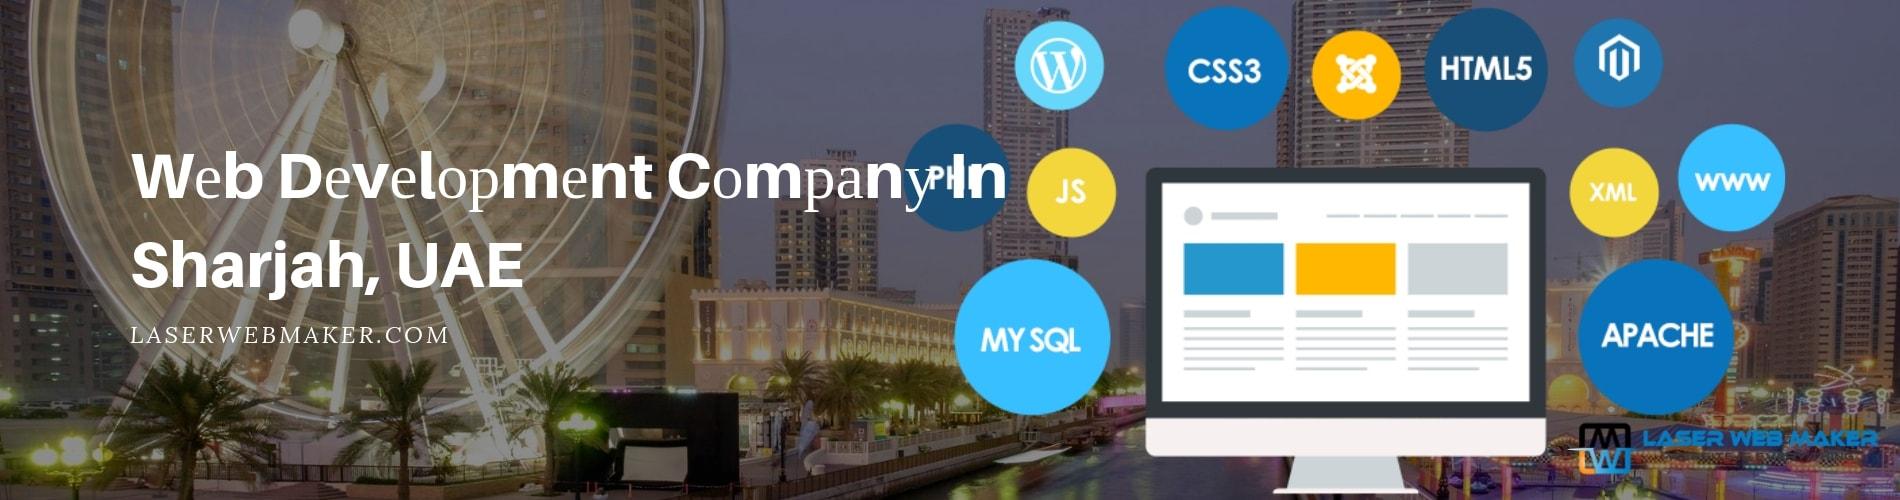 web development company in sharjah UAE